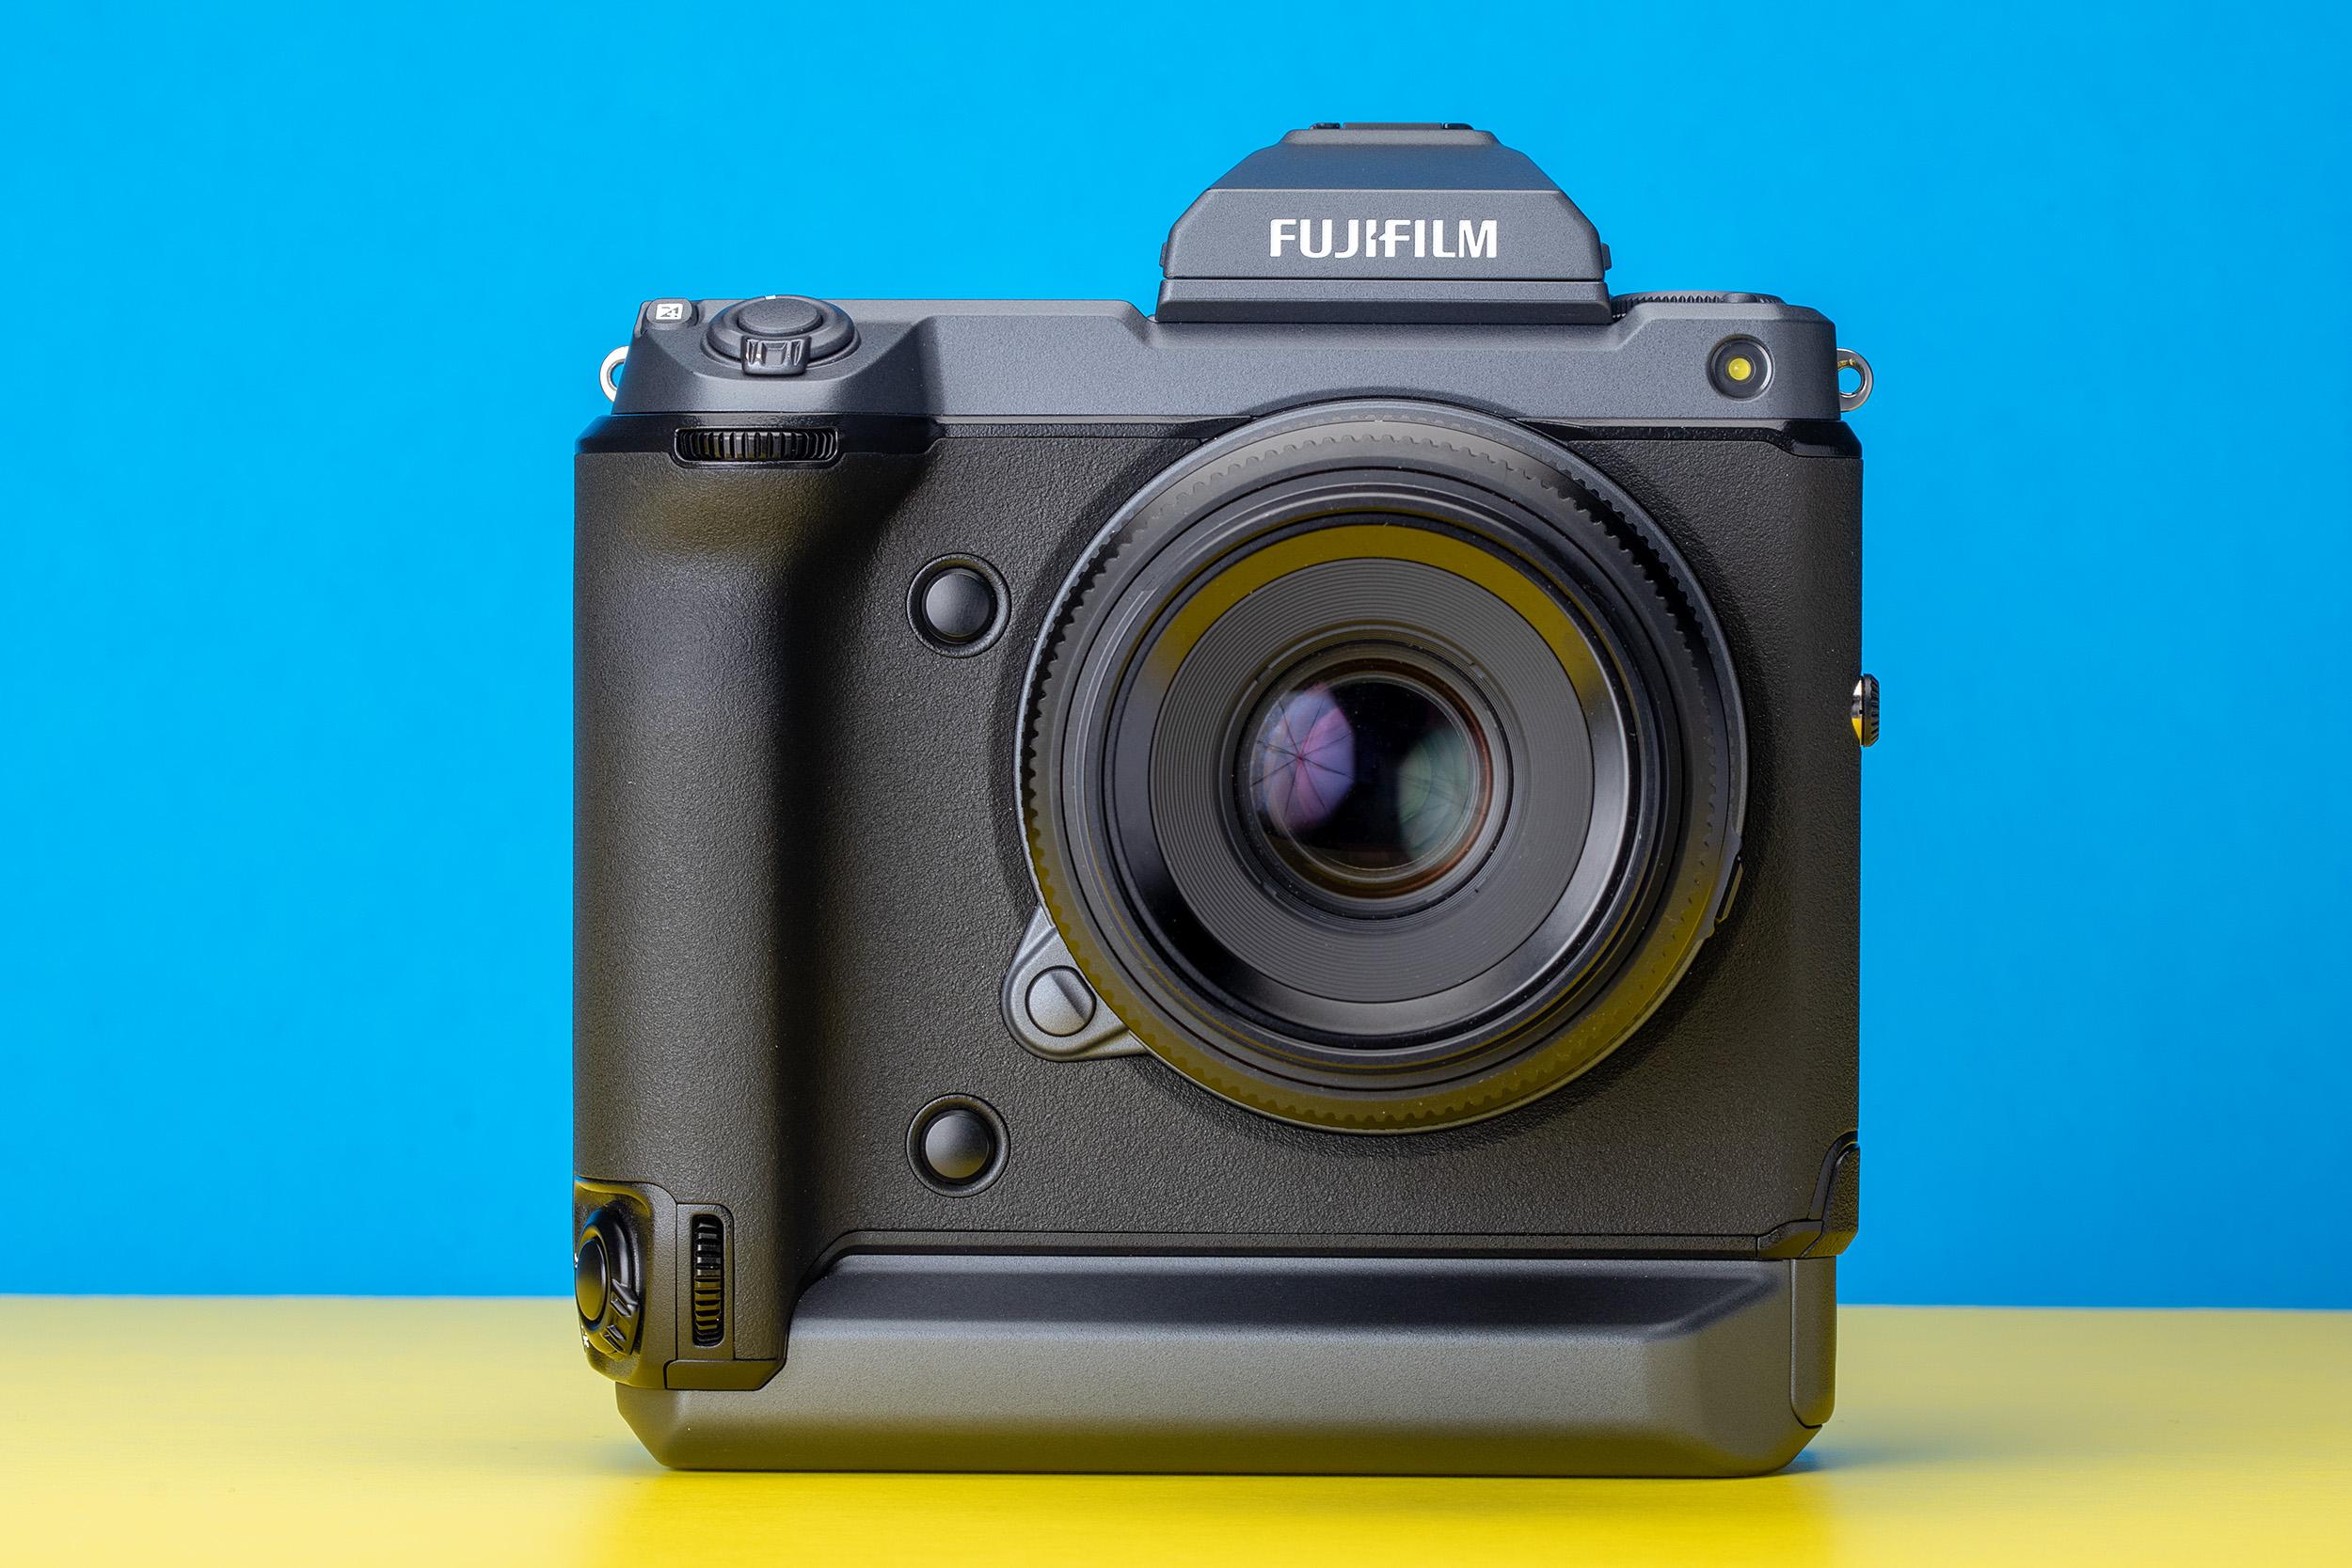 Fujifilm GFX 100 review: Digital Photography Review